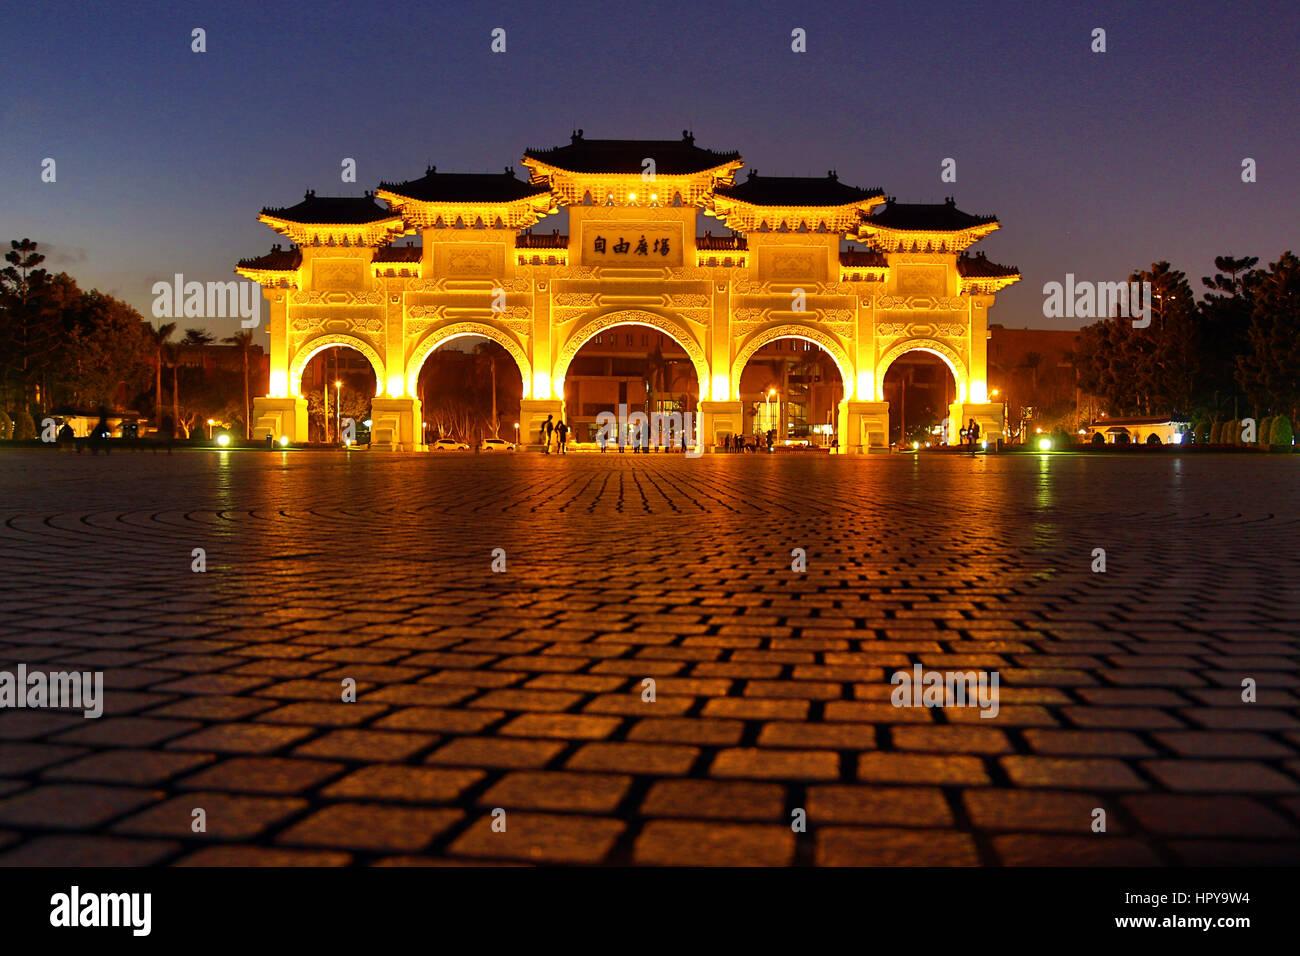 Le National Chiang Kai Shek Memorial Hall Main Gate illuminé de nuit à Taipei, Taiwan. Photo Stock